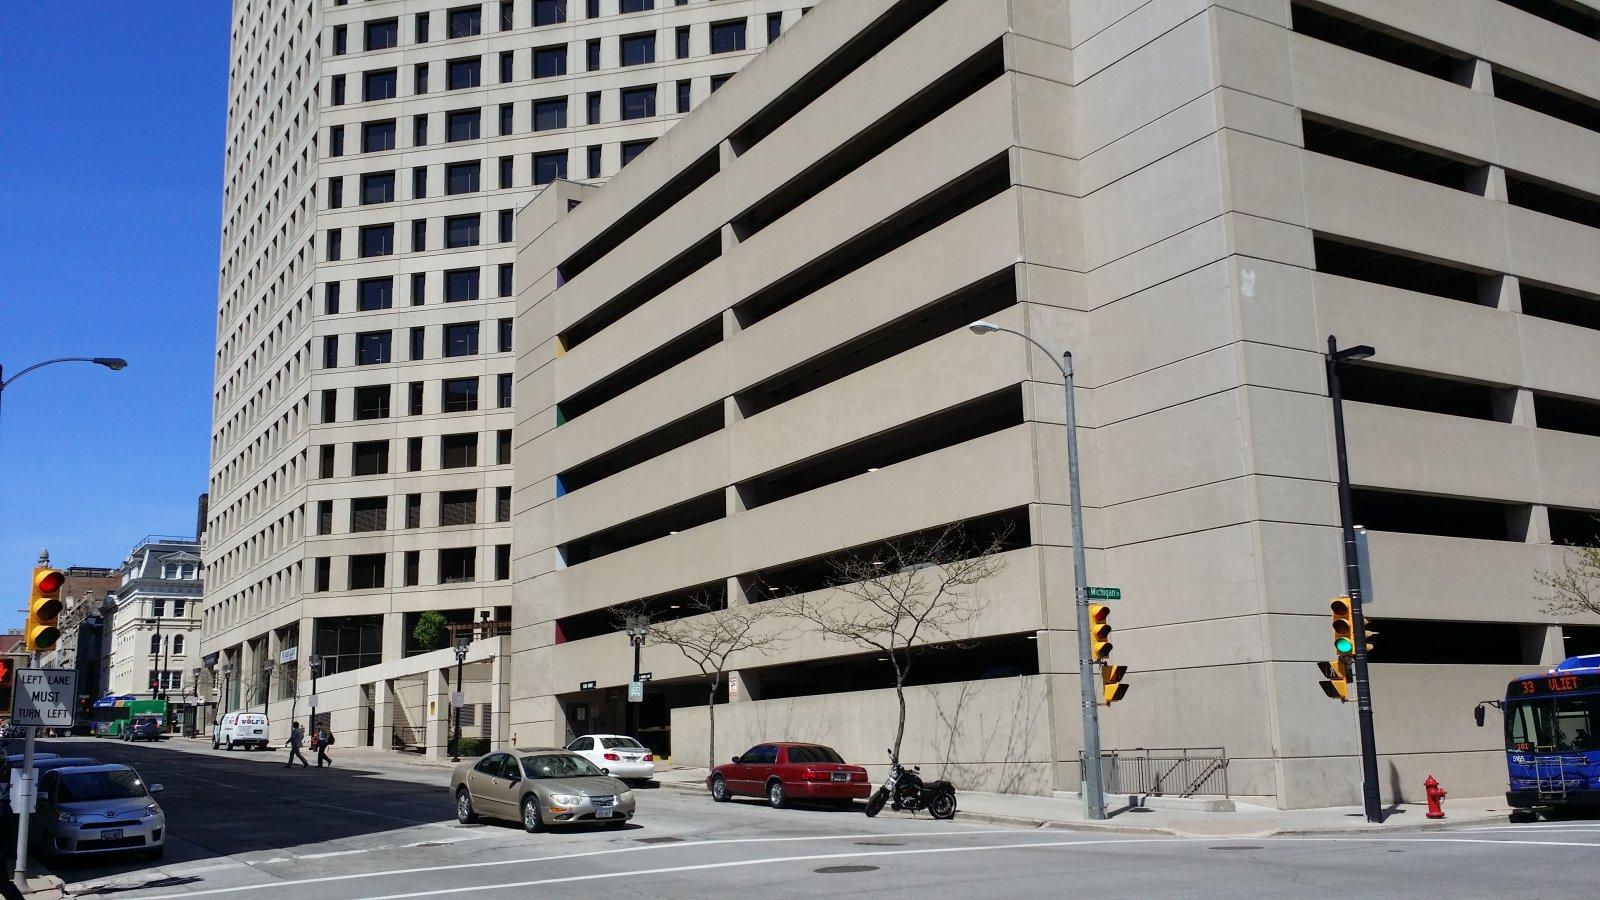 411 Building parking garage.